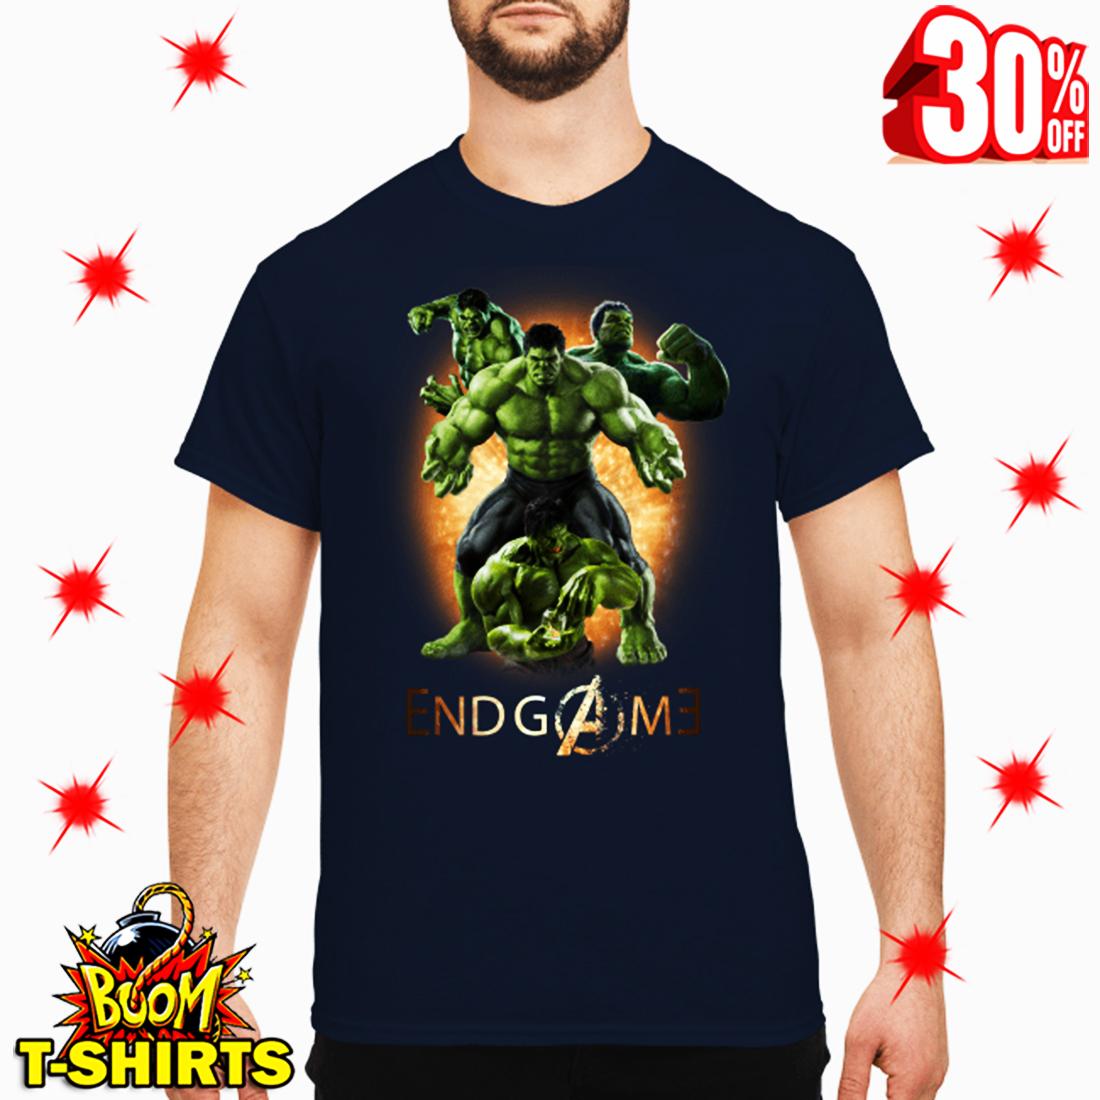 Hulk Avengers Endgame Signature shirt